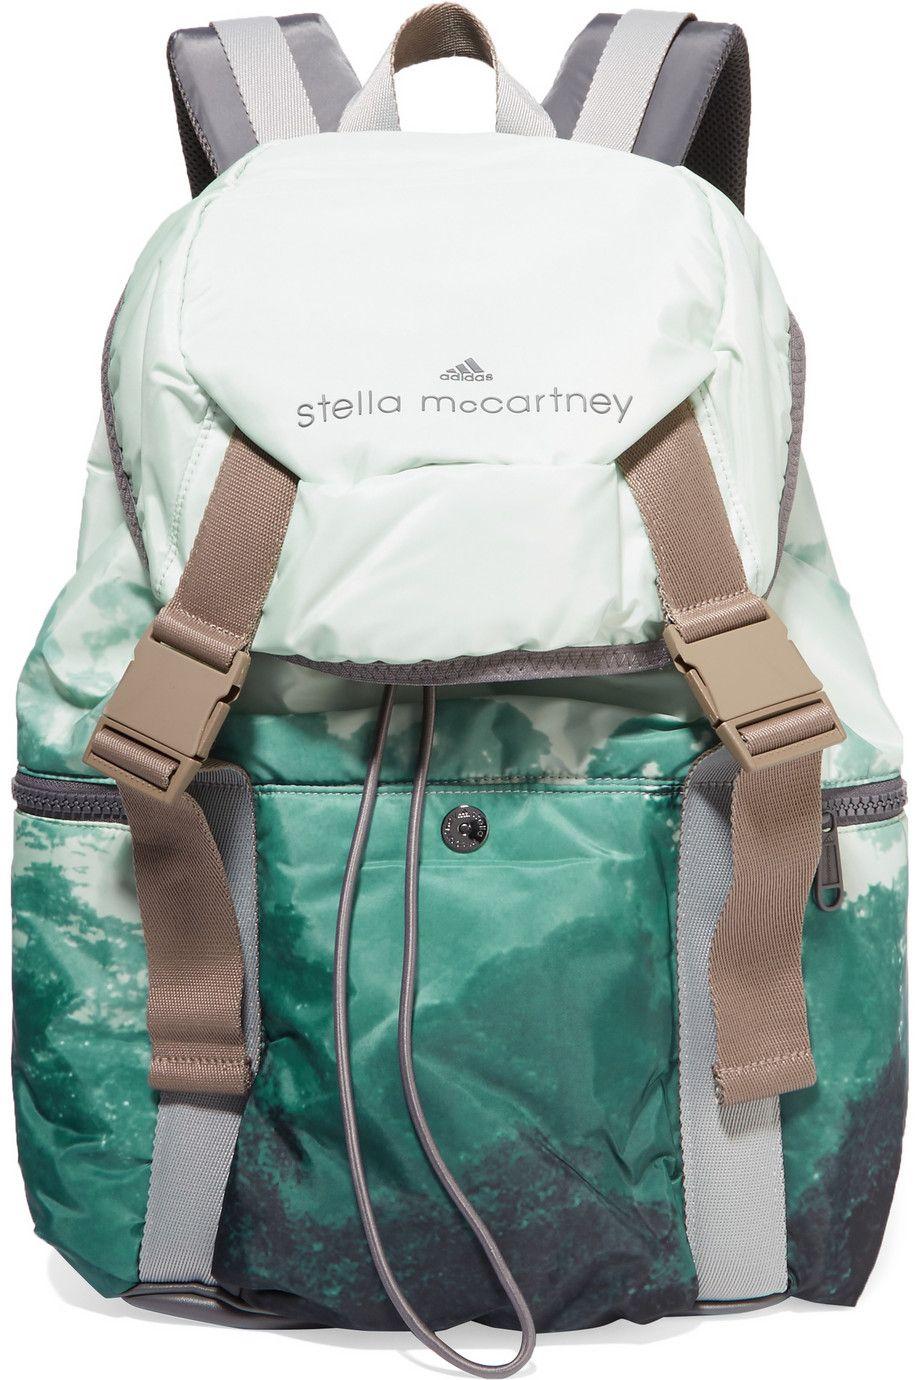 fee1f260fe90 ADIDAS BY STELLA MCCARTNEY Weekender Printed Shell Backpack.   adidasbystellamccartney  bags  backpacks